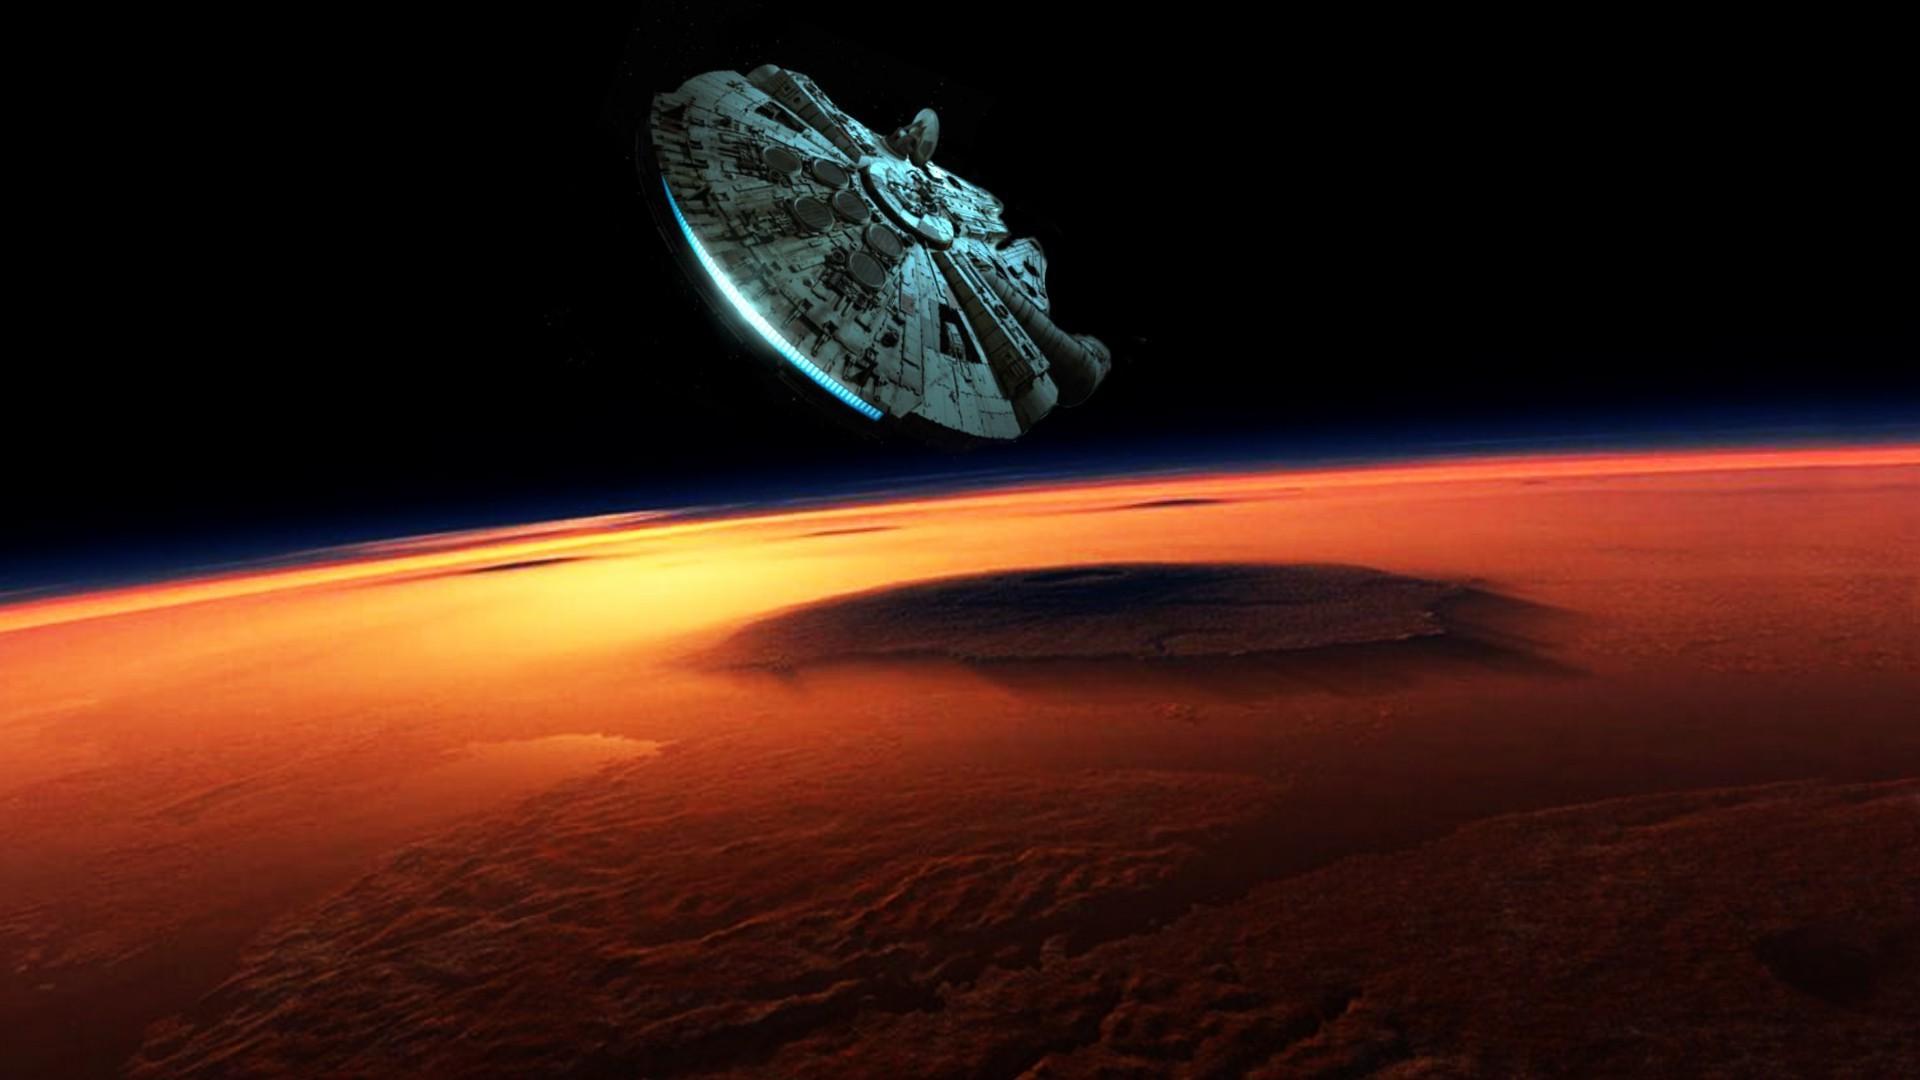 Star Wars, Planet, Space, Millennium Falcon wallpaper